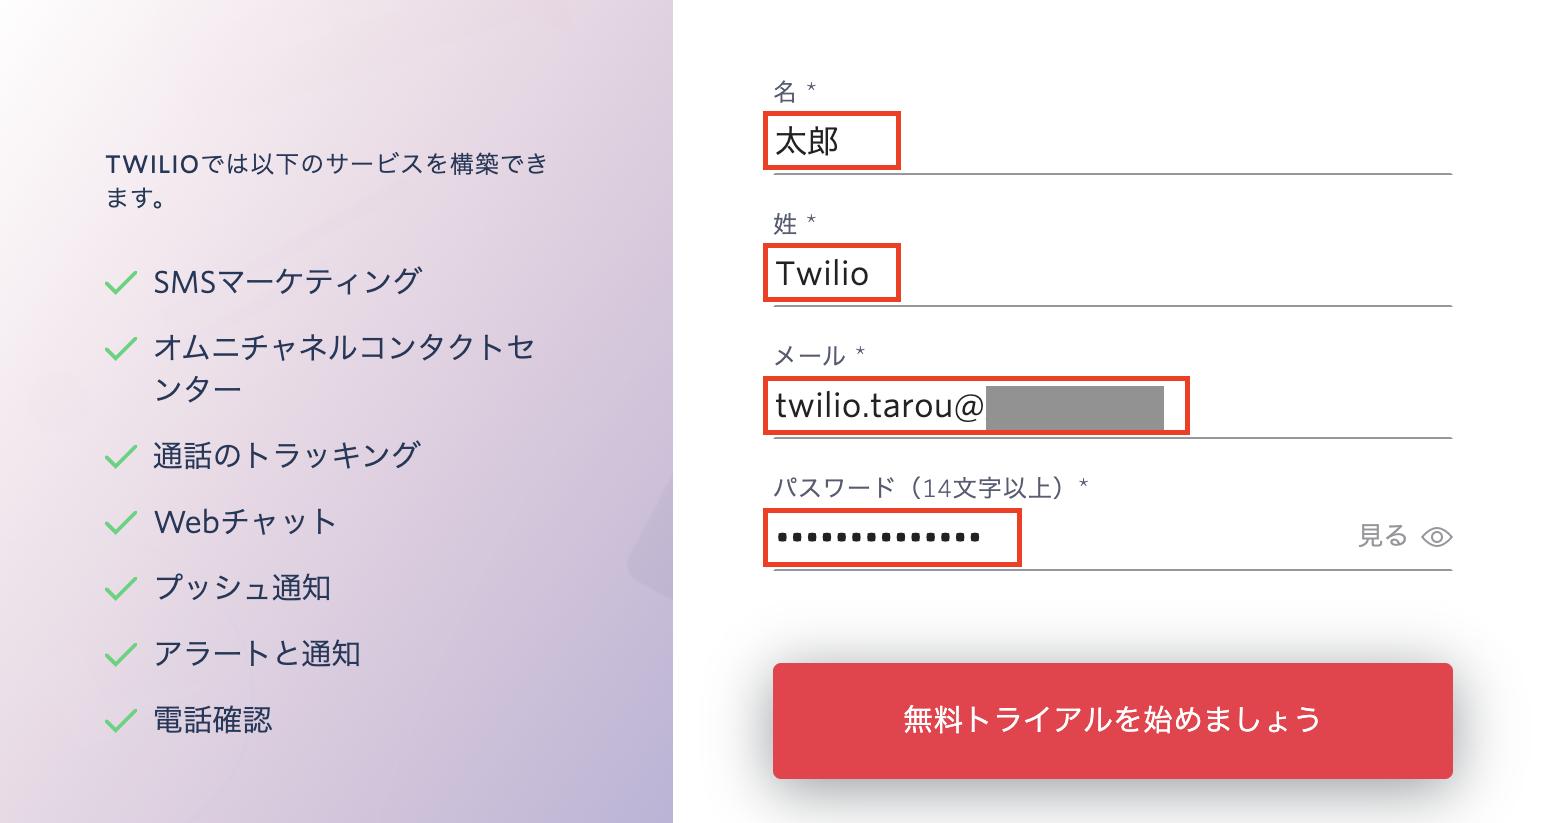 twilio-account-page